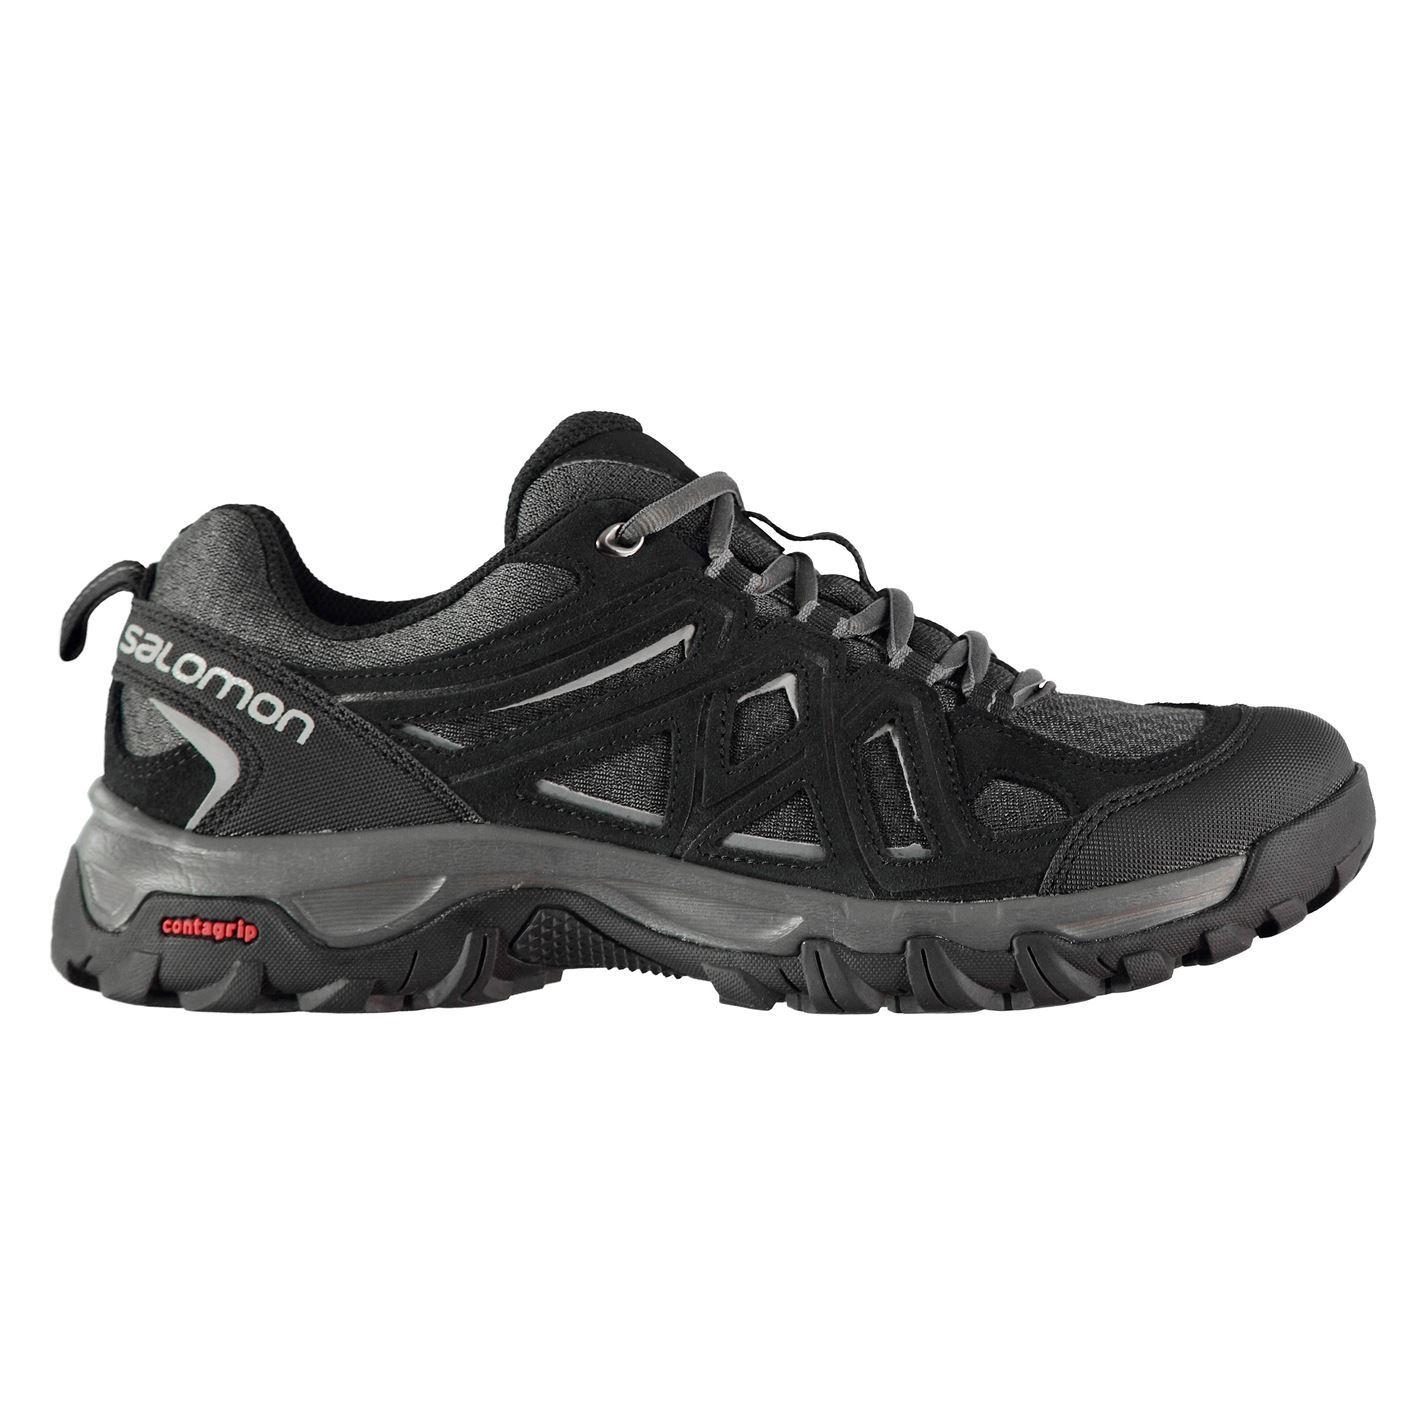 Details about Salomon Evasion 2 Aero Mens Walking Shoes Trainers Black Footwear Sneakers